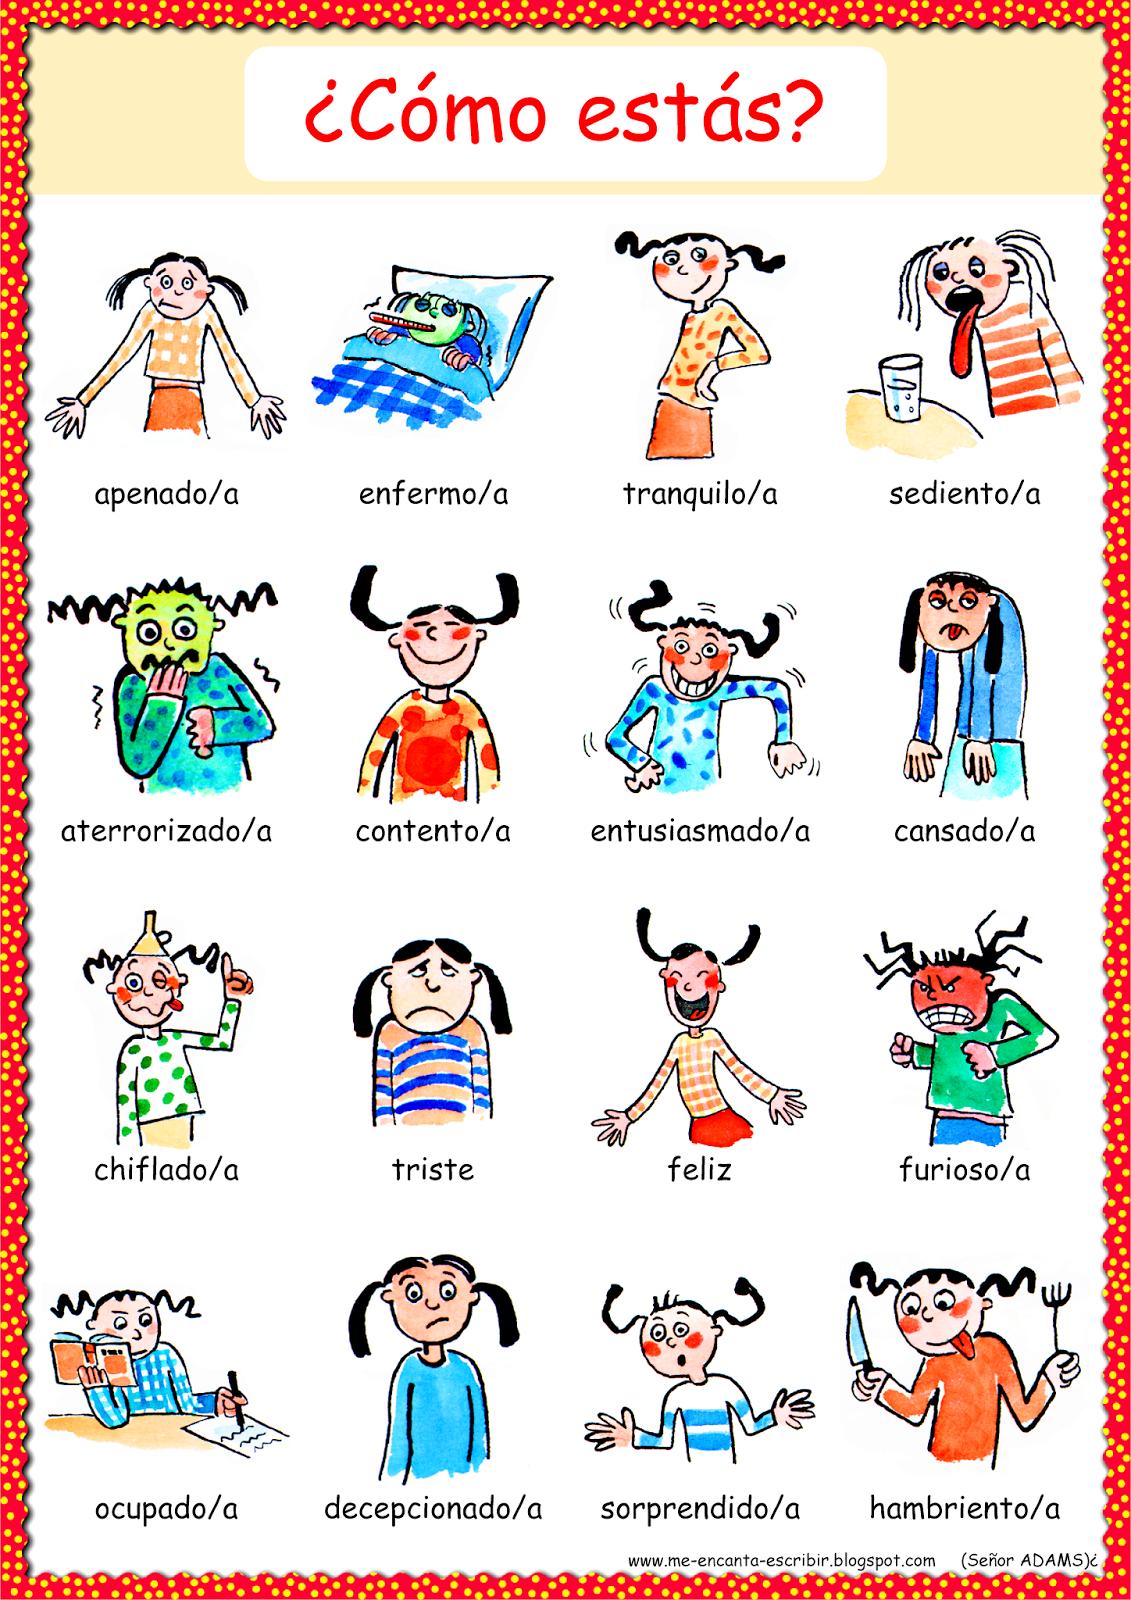 Me Encanta Escribir En Espanol Como Estas Como Te Sientes Adjetivos